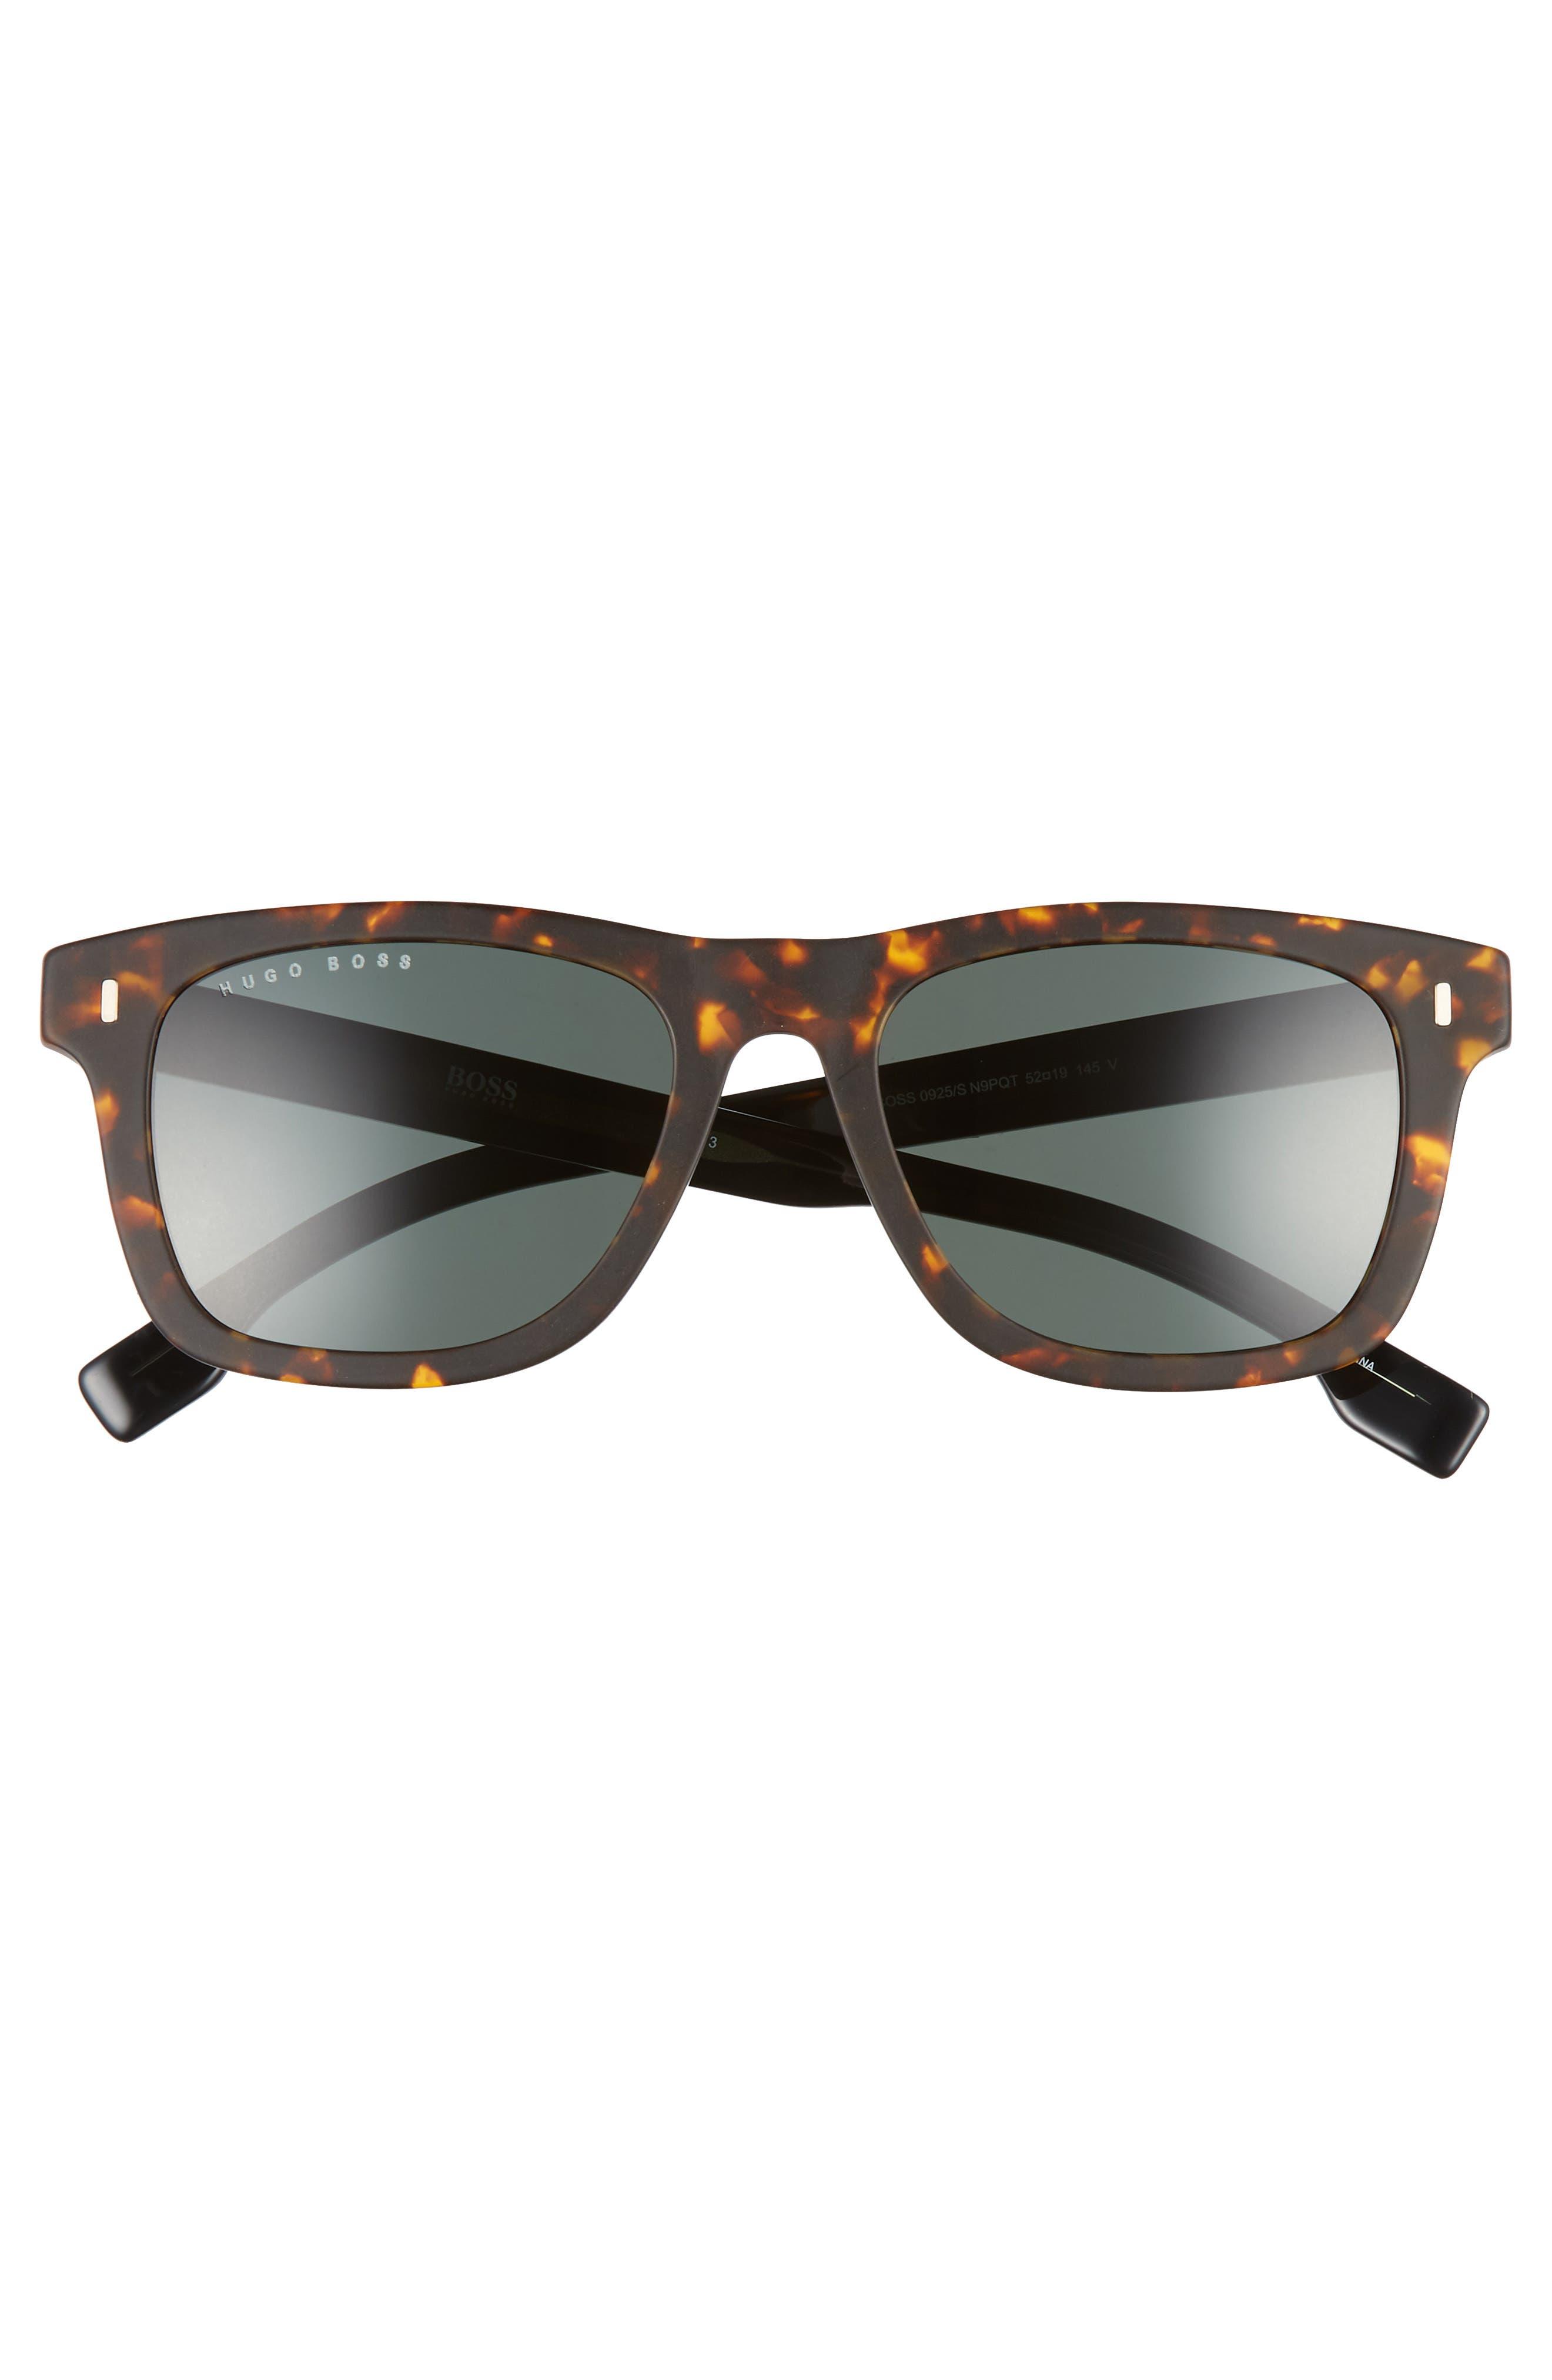 52mm Sunglasses,                             Alternate thumbnail 2, color,                             MATTE HAVANA